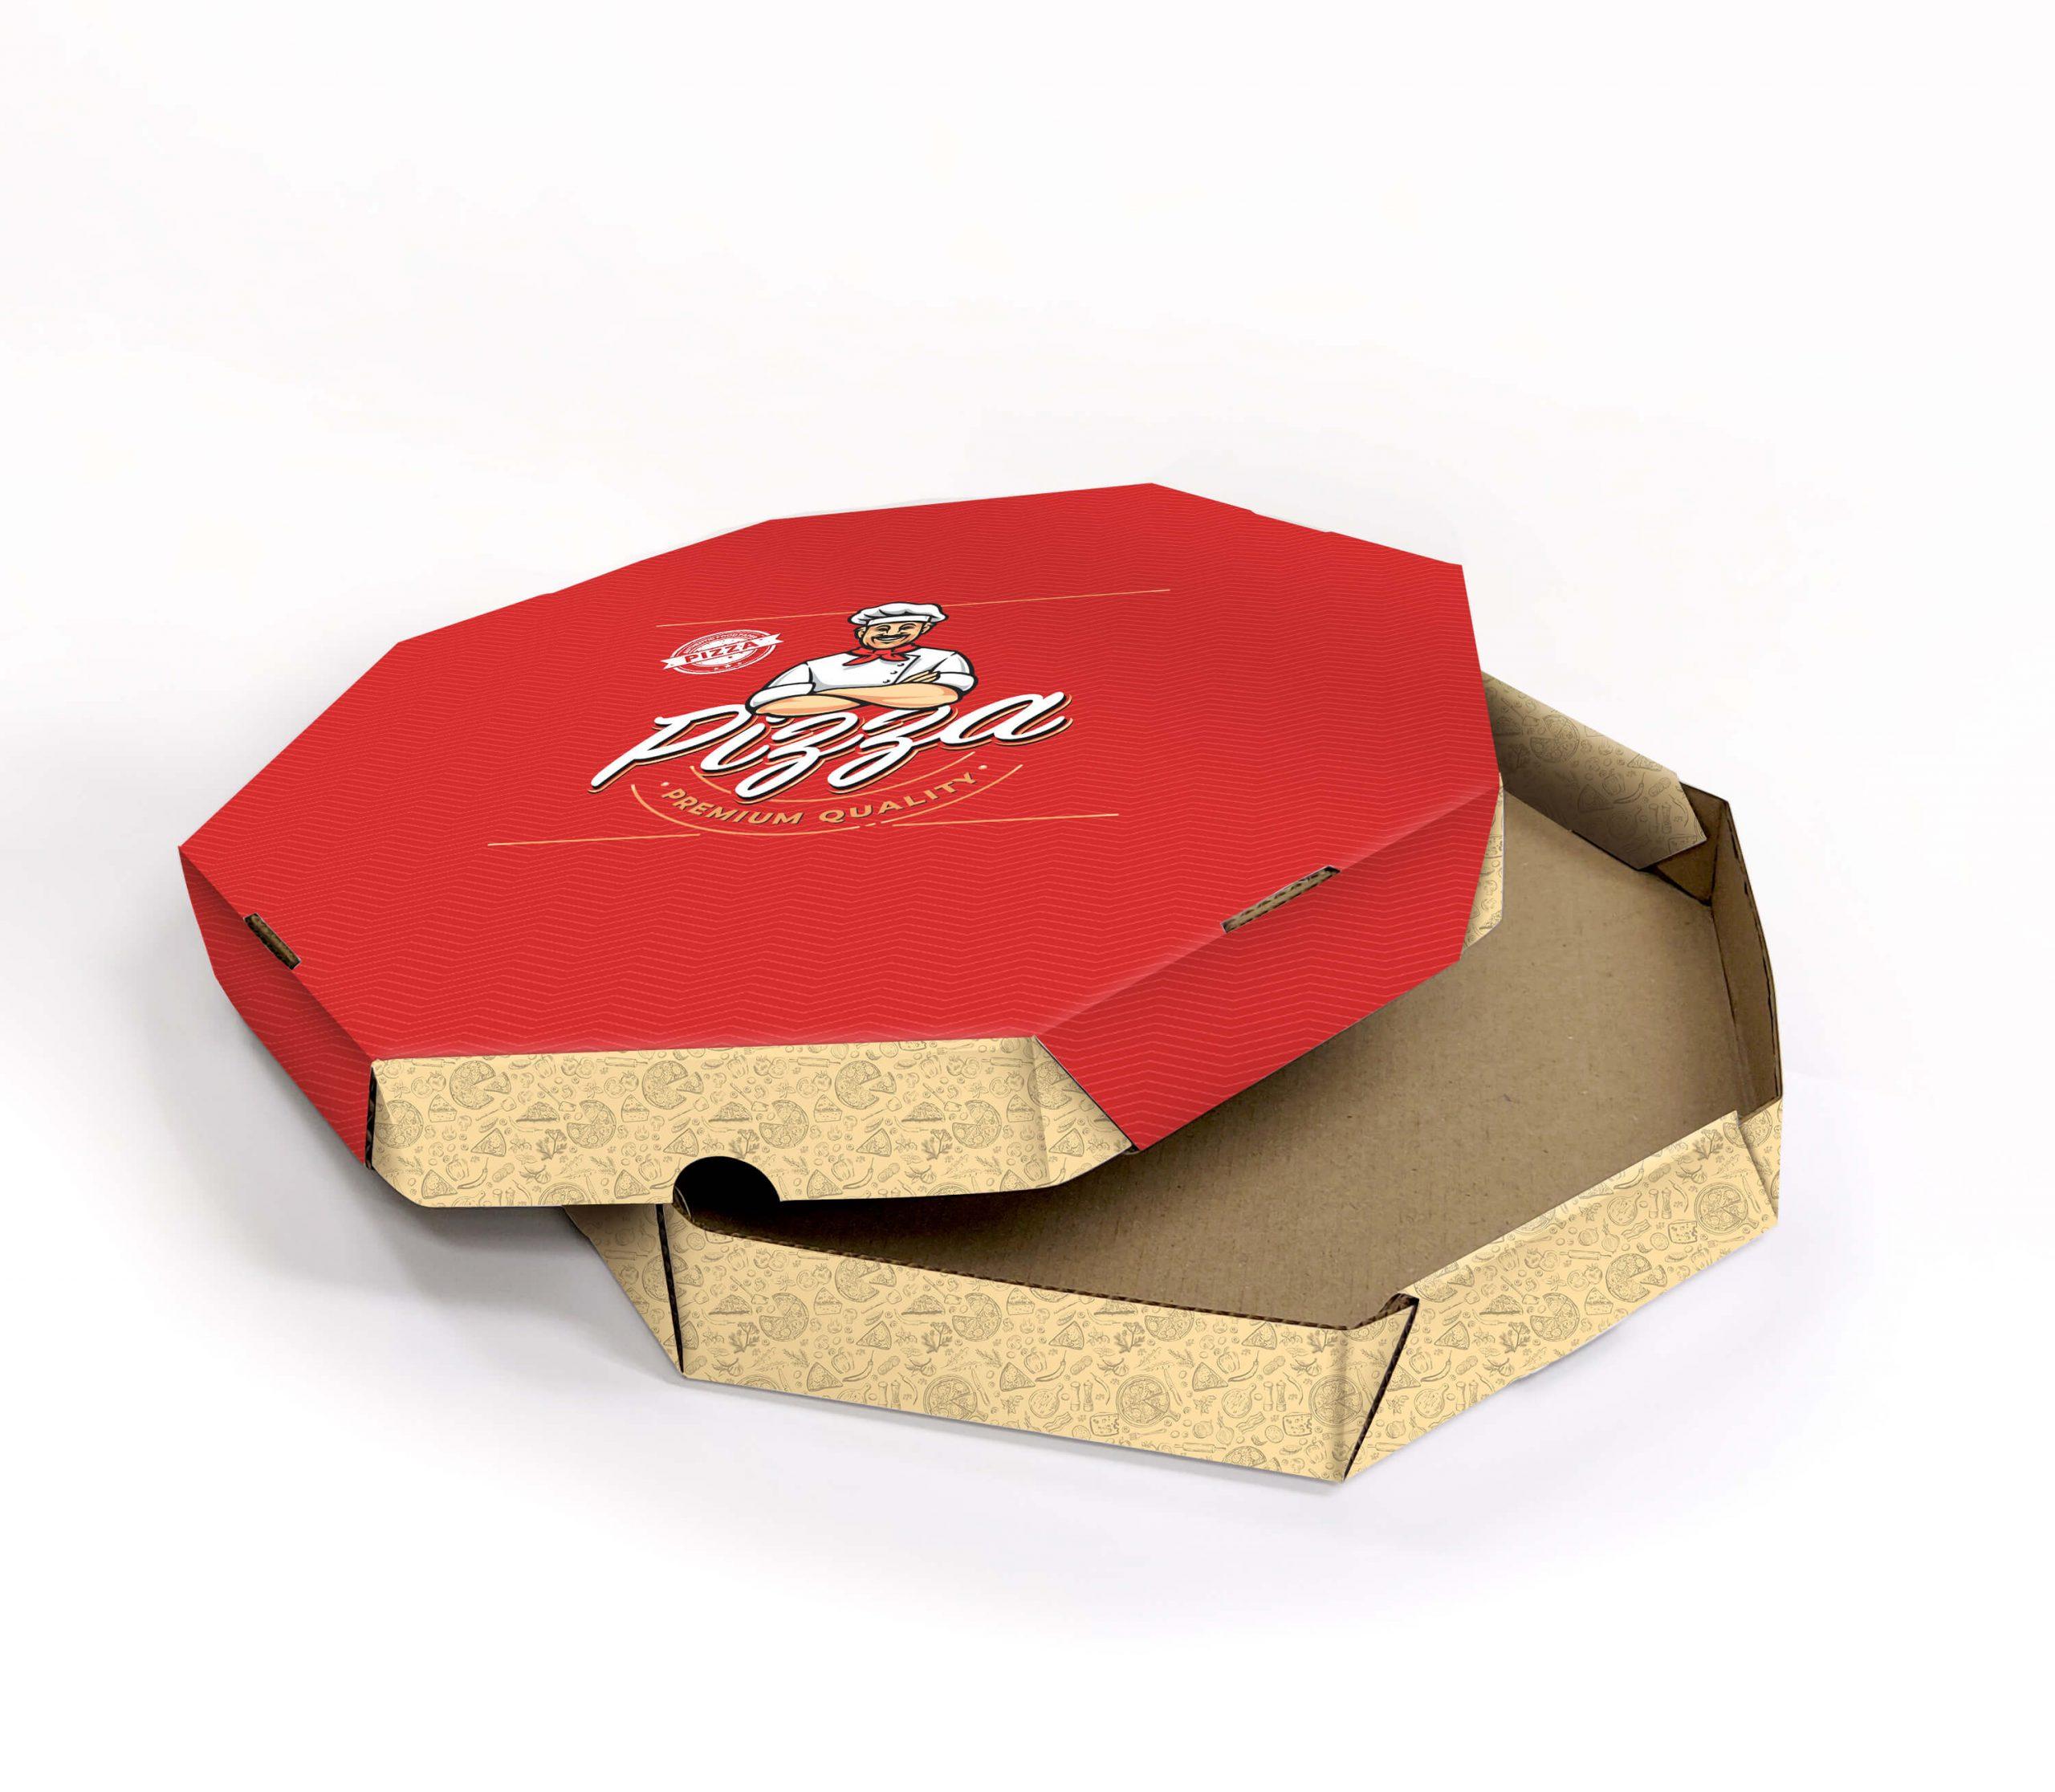 Caixa de Pizza Personalizda